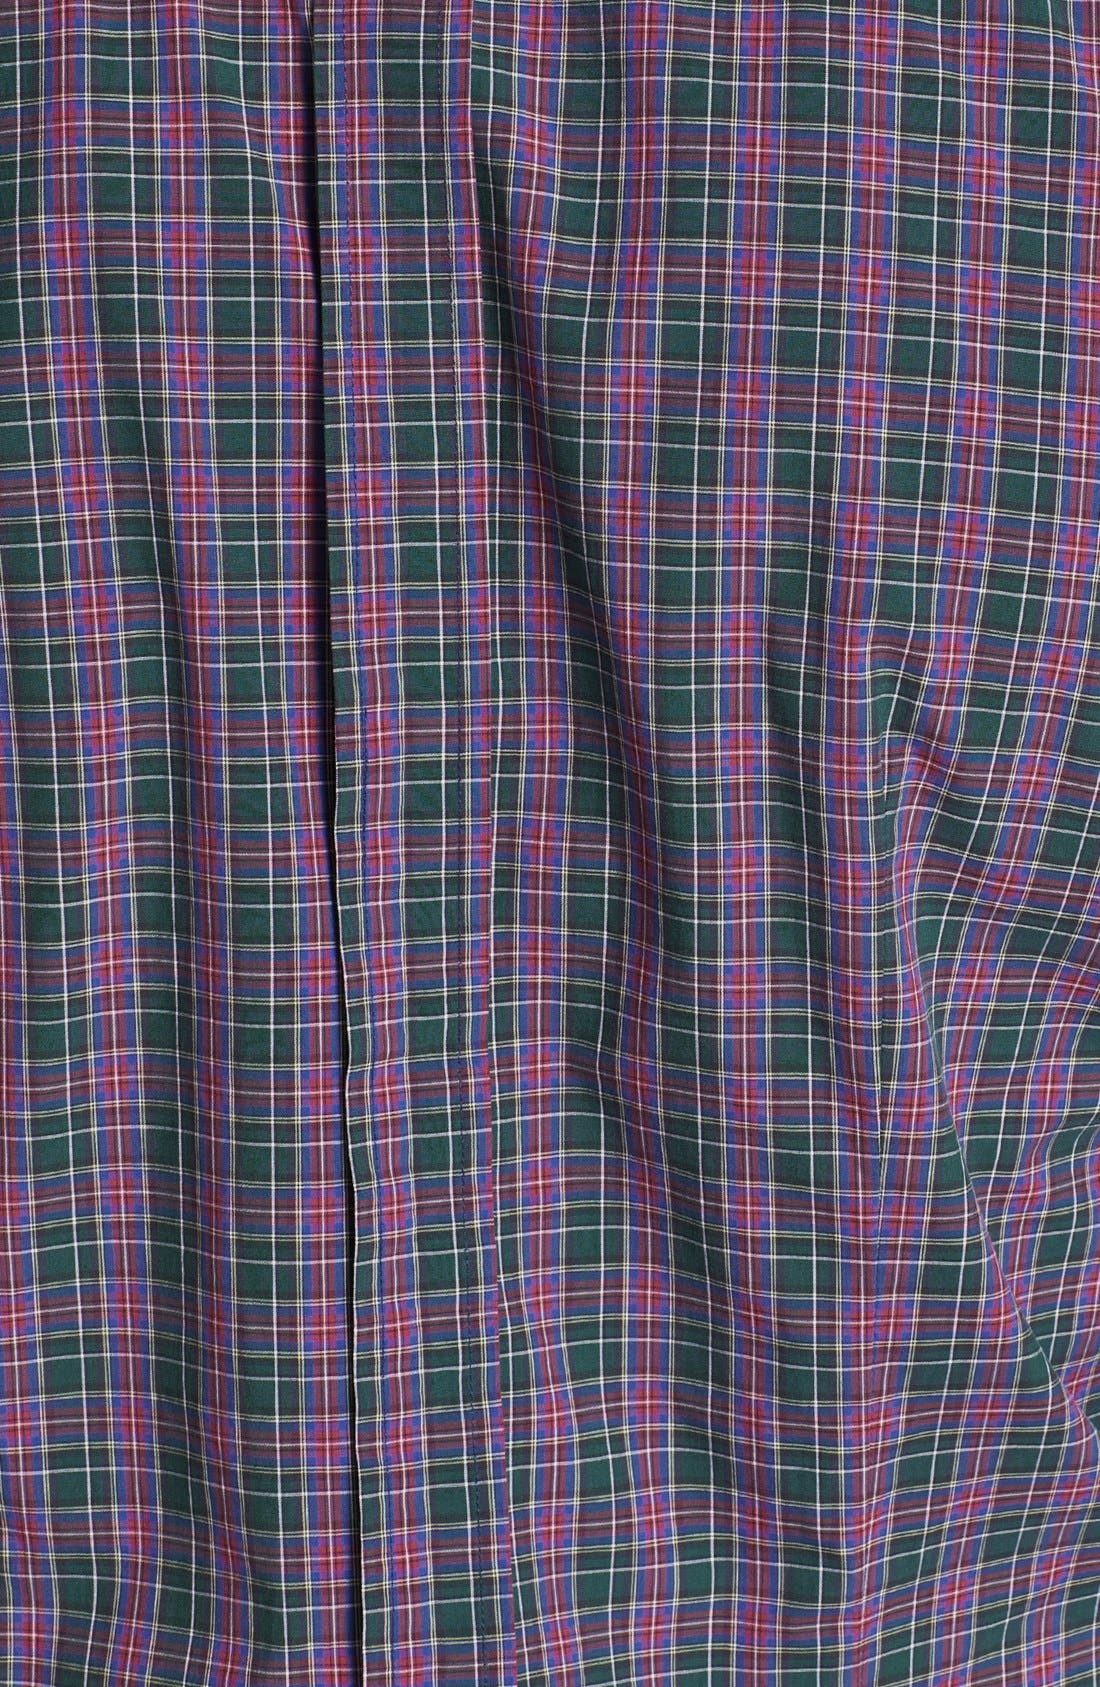 Alternate Image 3  - Band of Outsiders 'Ranger' Plaid Cotton Shirt